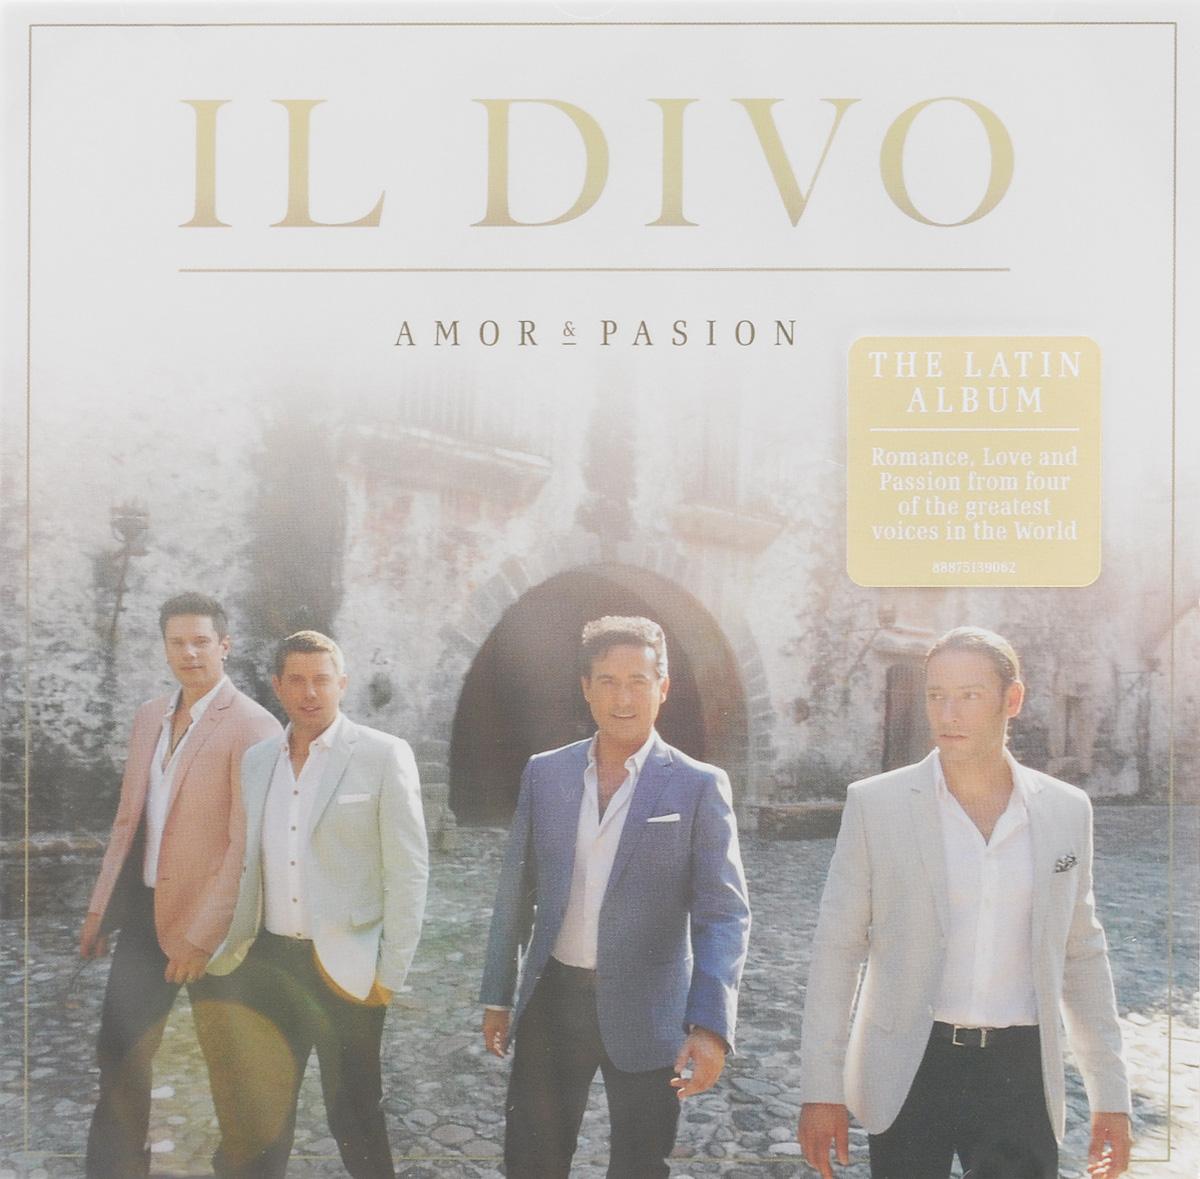 Il Divo. Amor & Pasion